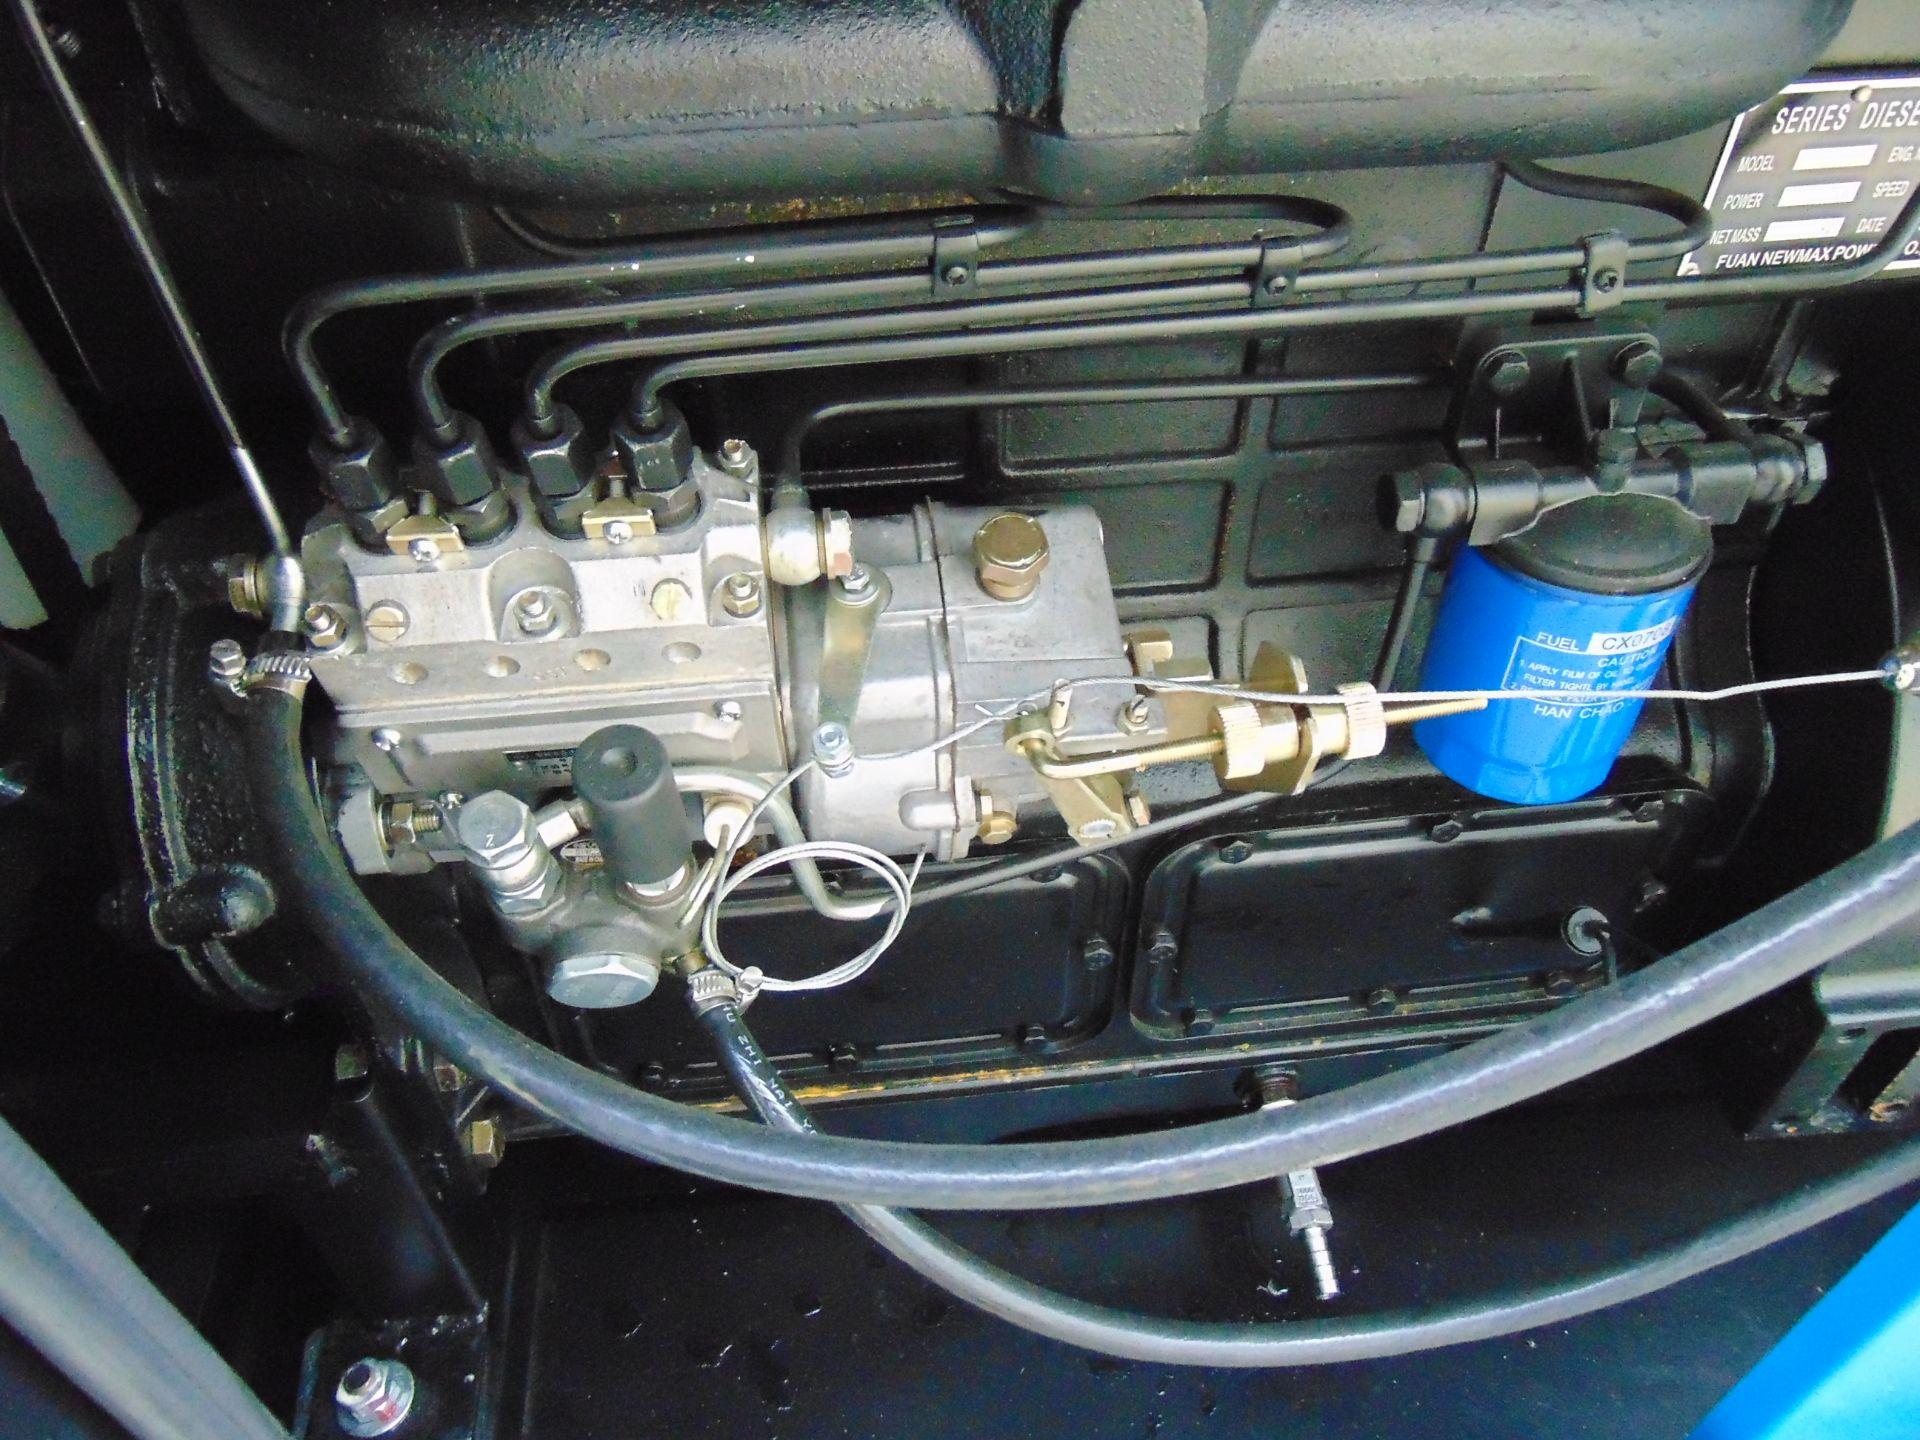 Lot 4 - UNISSUED 40 KVA 3 Phase Silent Diesel Generator Set